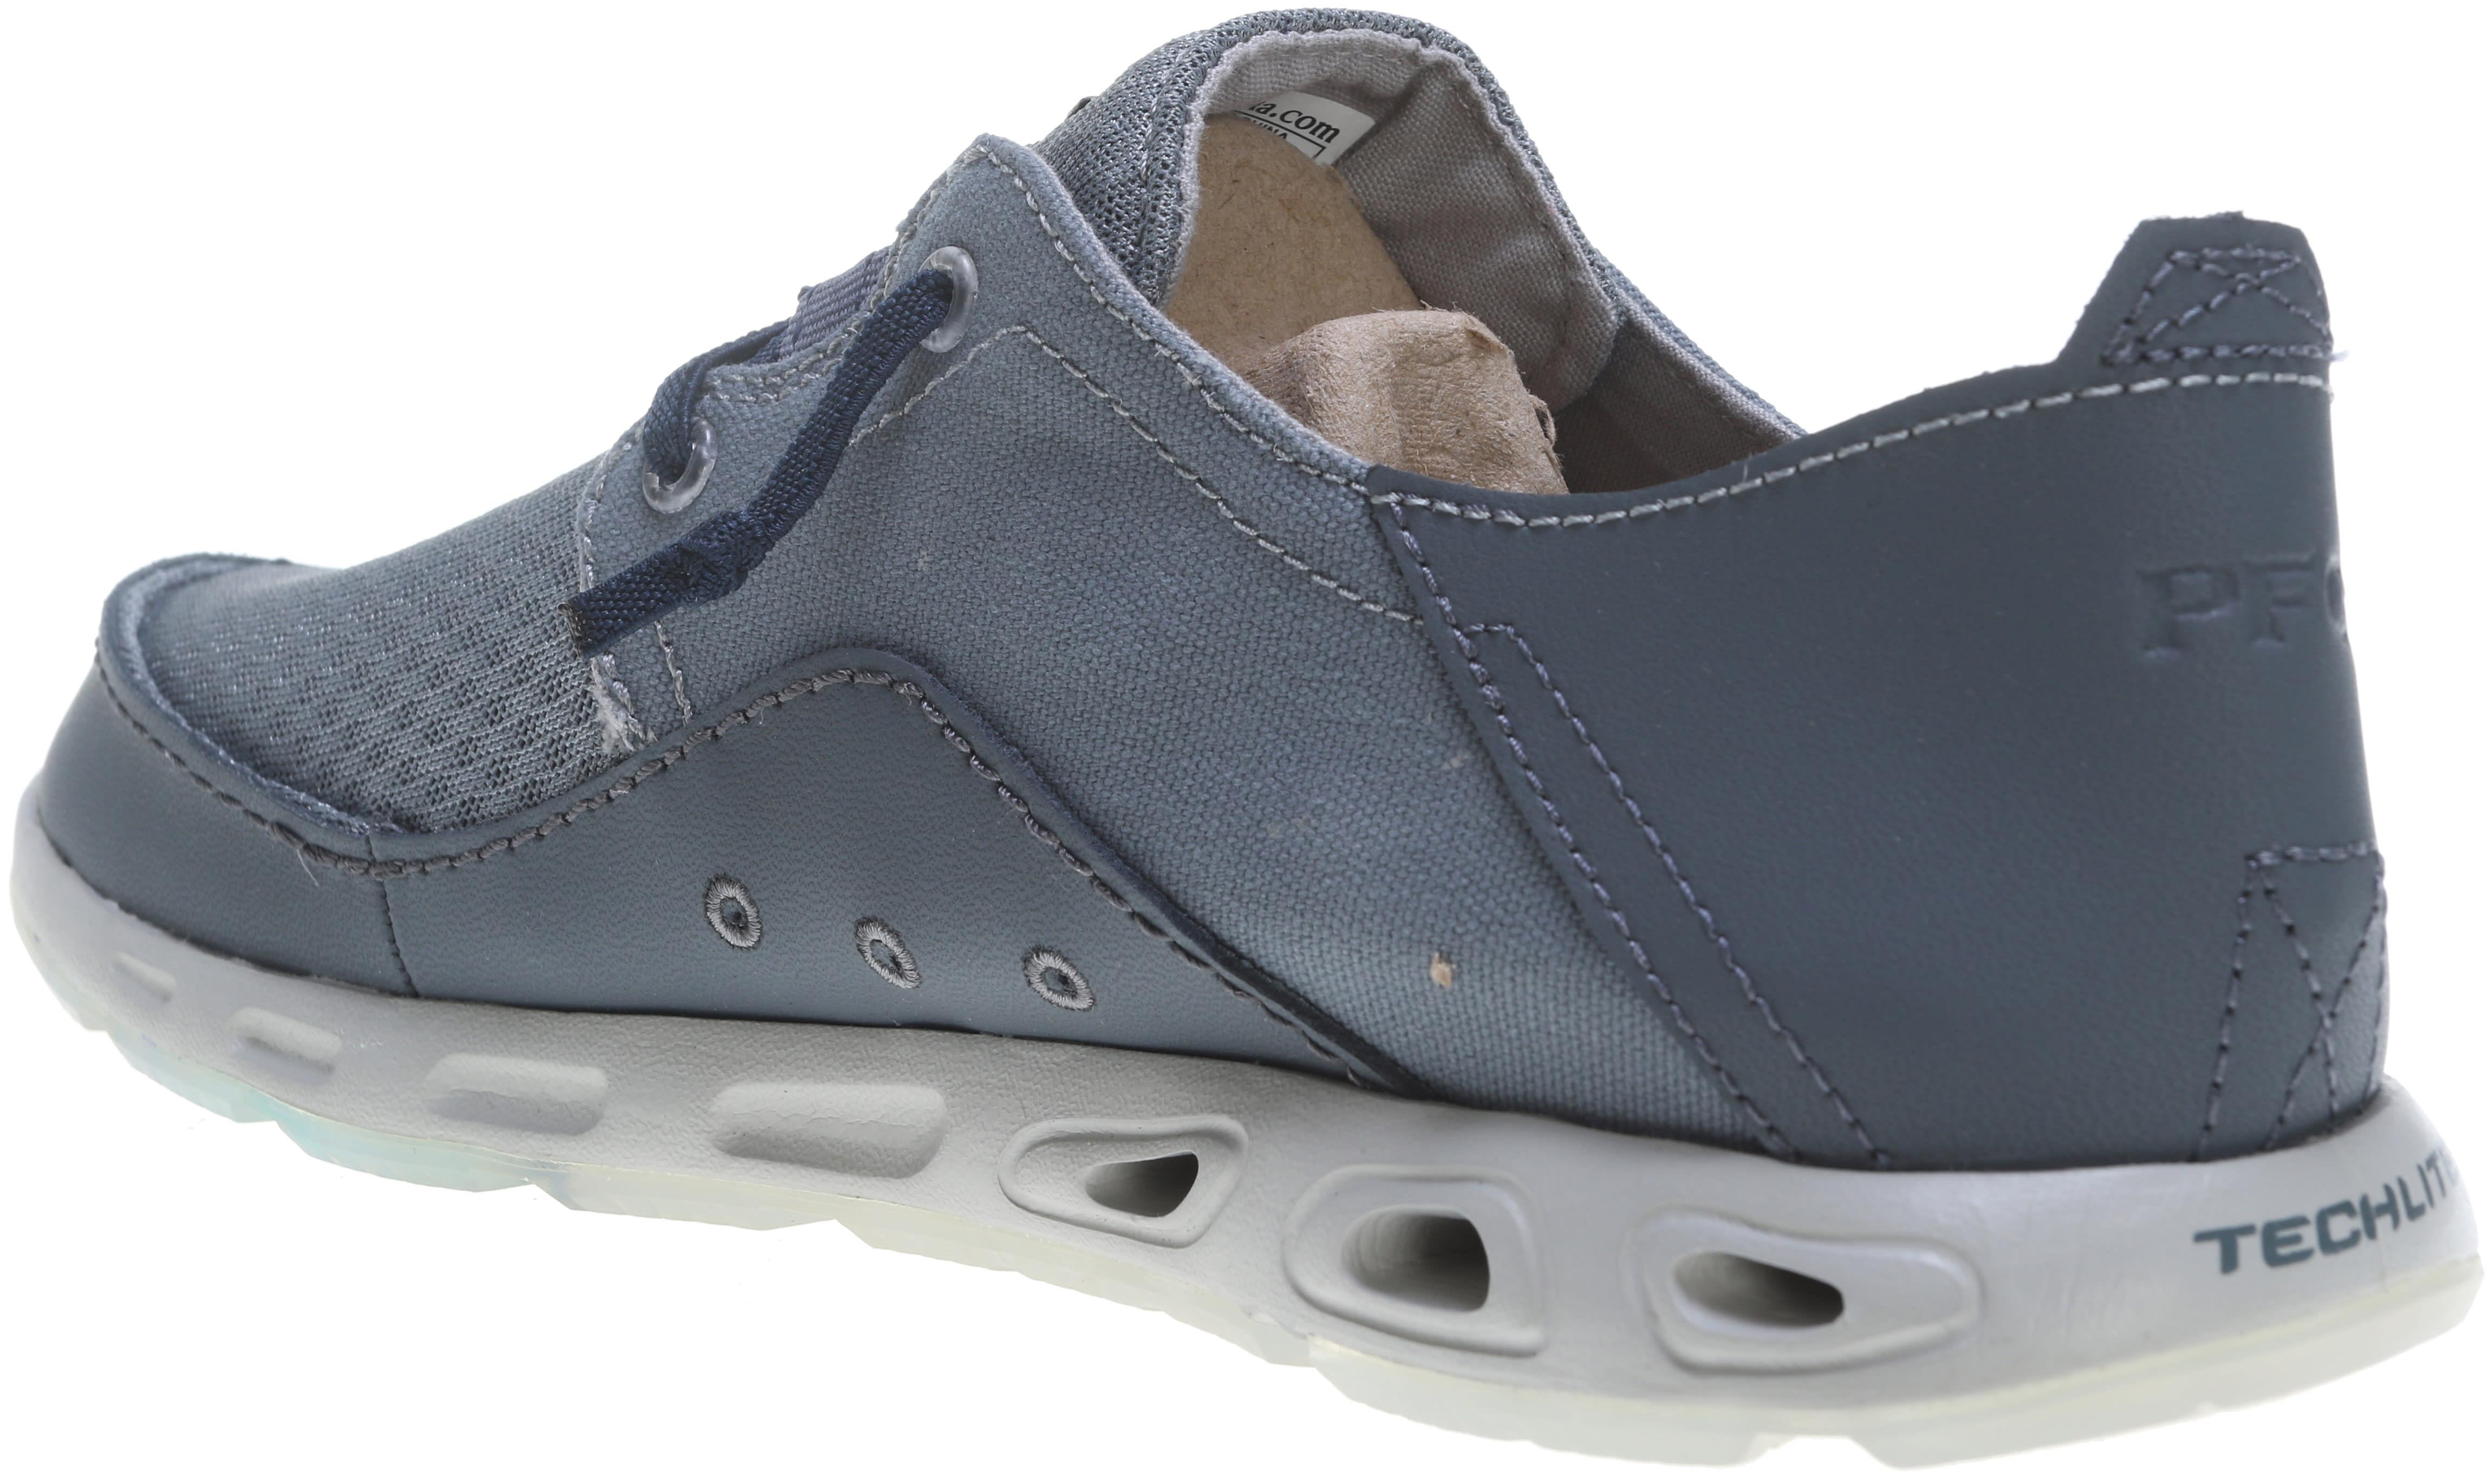 Columbia Bahama Vent Relaxed Marlin Pfg Shoes